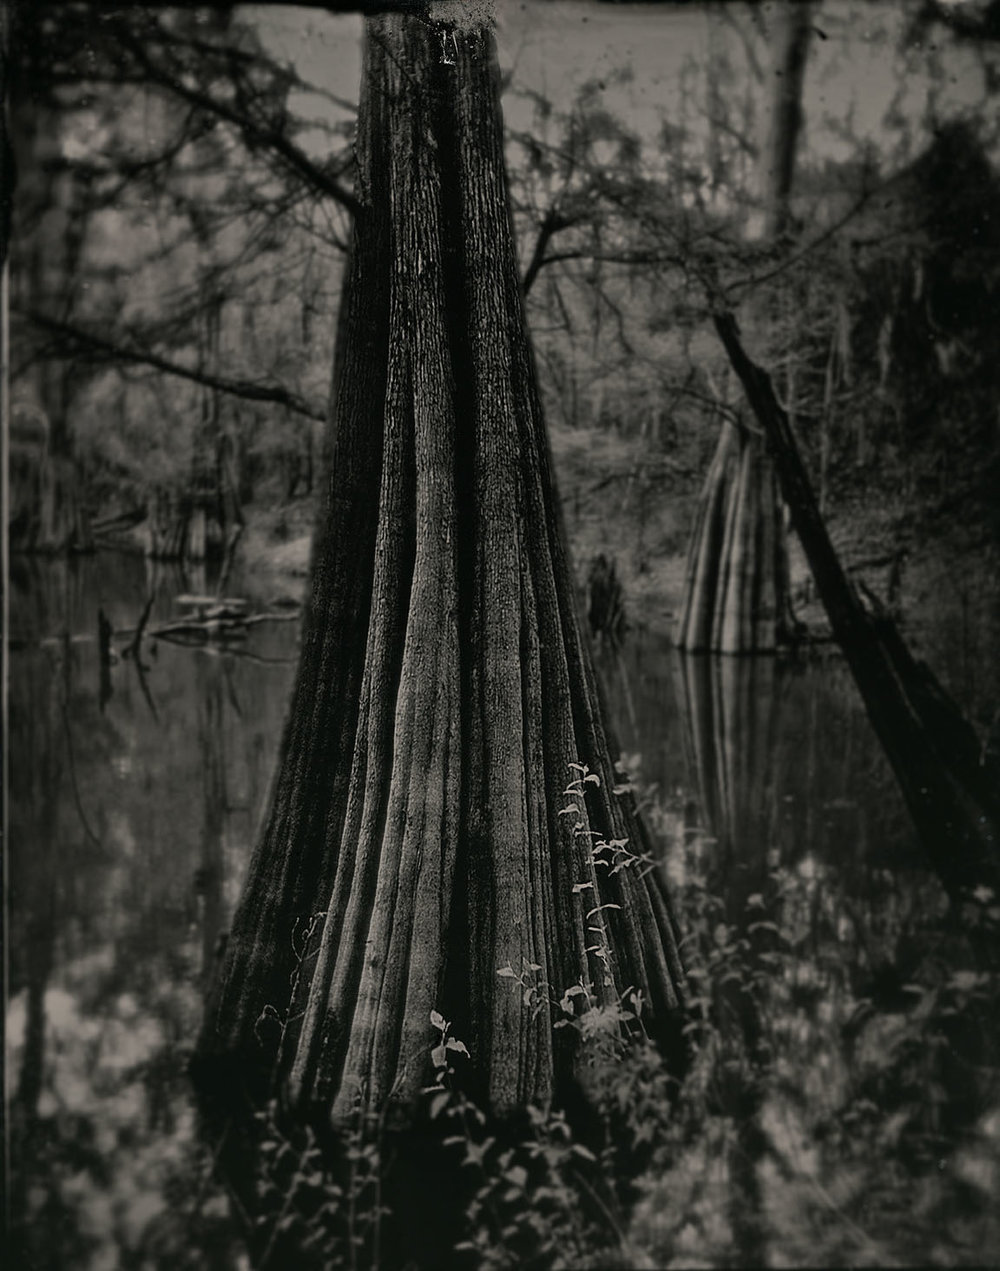 Swamp - Gary Geboy  www.garygeboyphotography.com